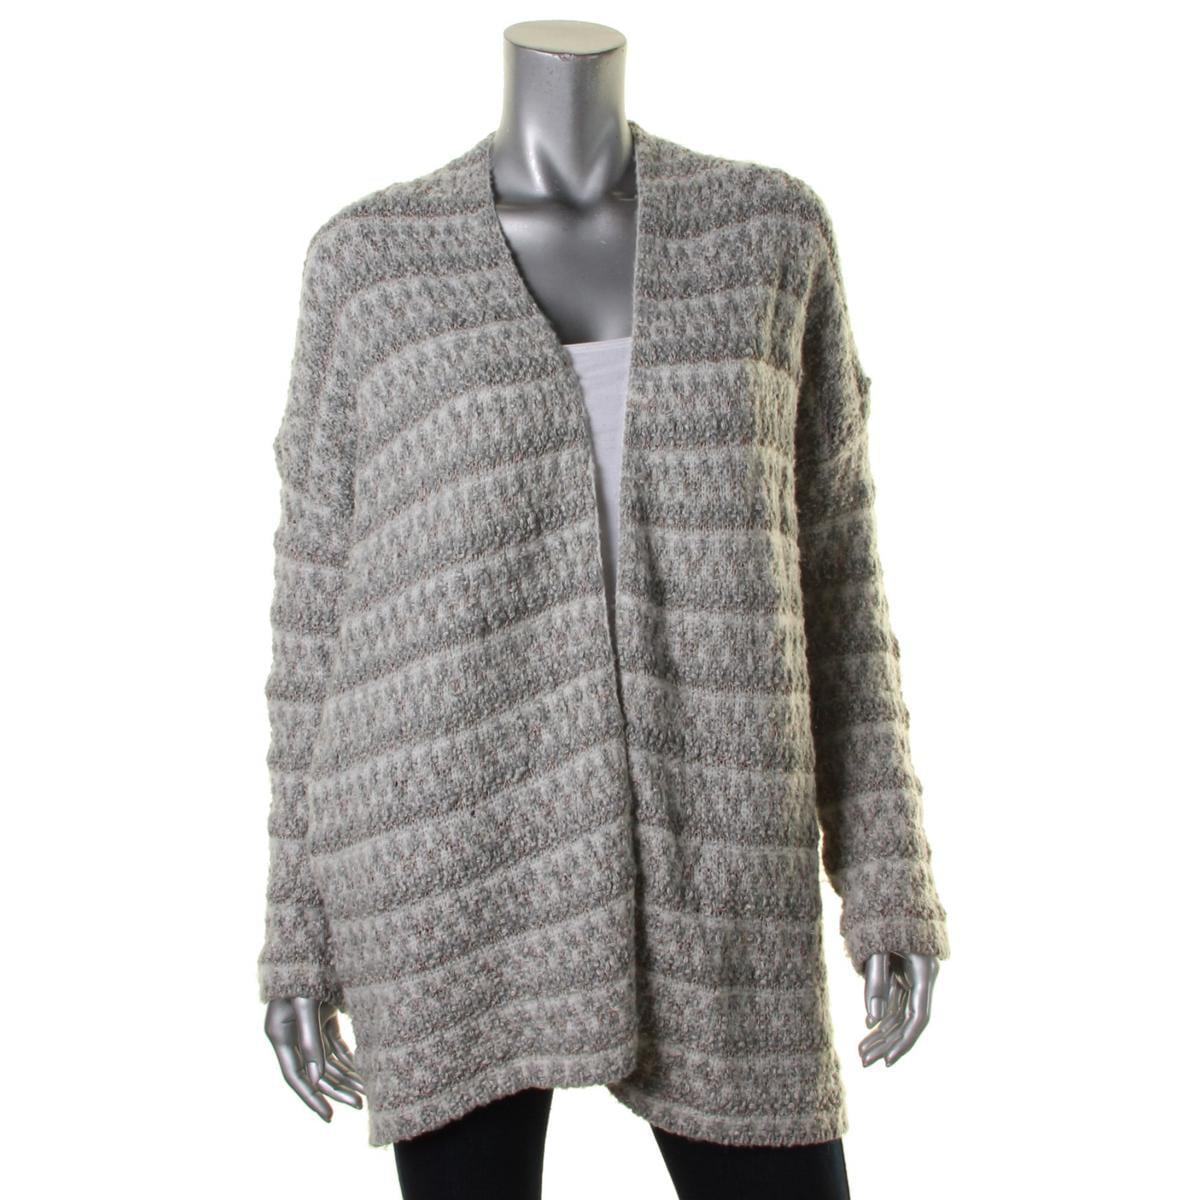 Joie Womens Lerado Metallic Open Front Cardigan Sweater